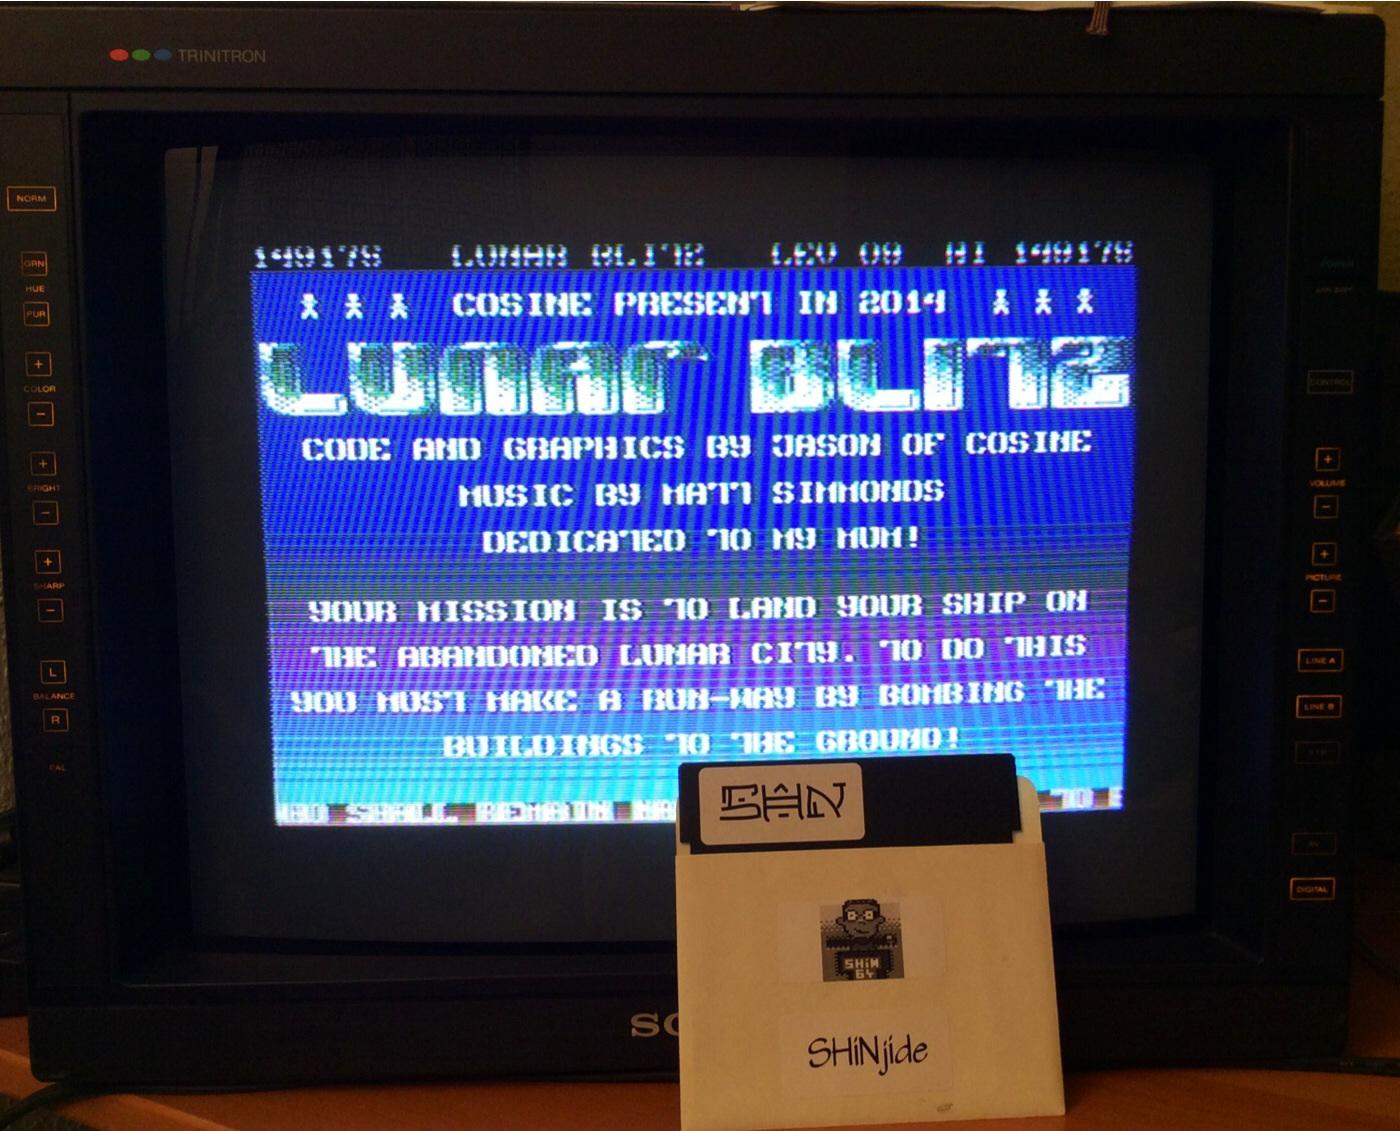 SHiNjide: Lunar Blitz RX (Commodore 64) 149,175 points on 2014-07-29 00:05:56